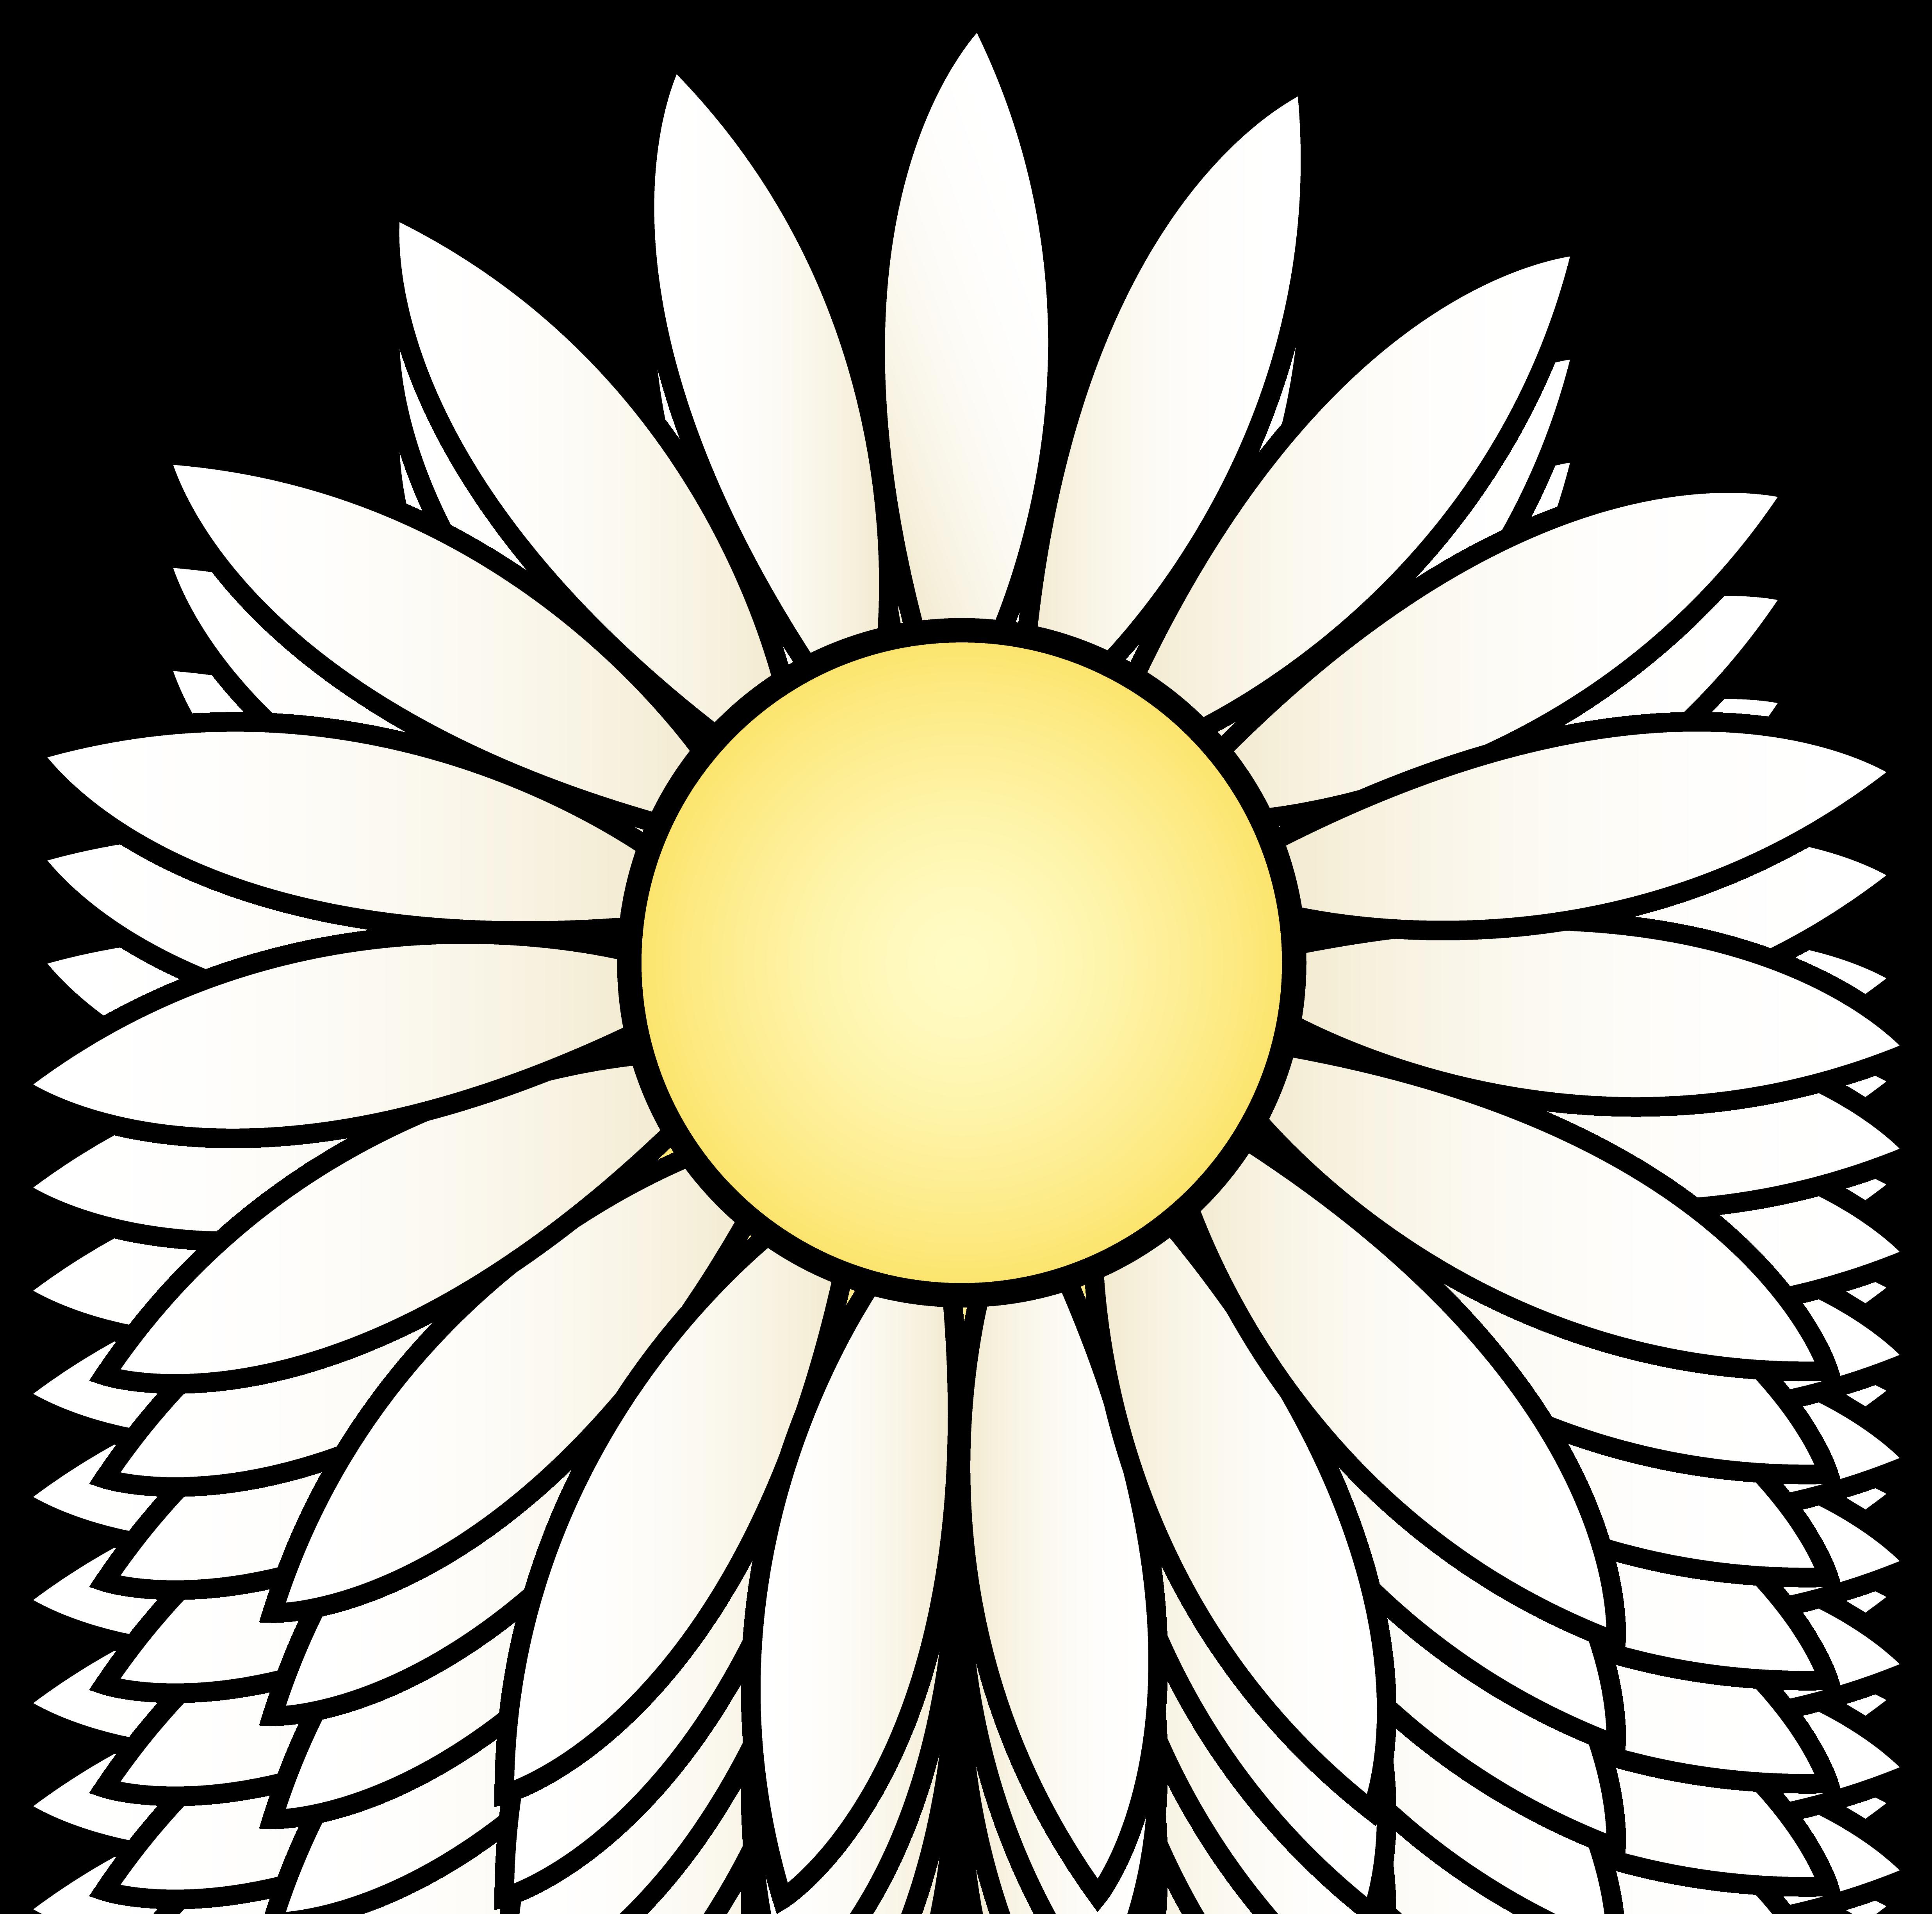 more flower templates | Granny's Gab